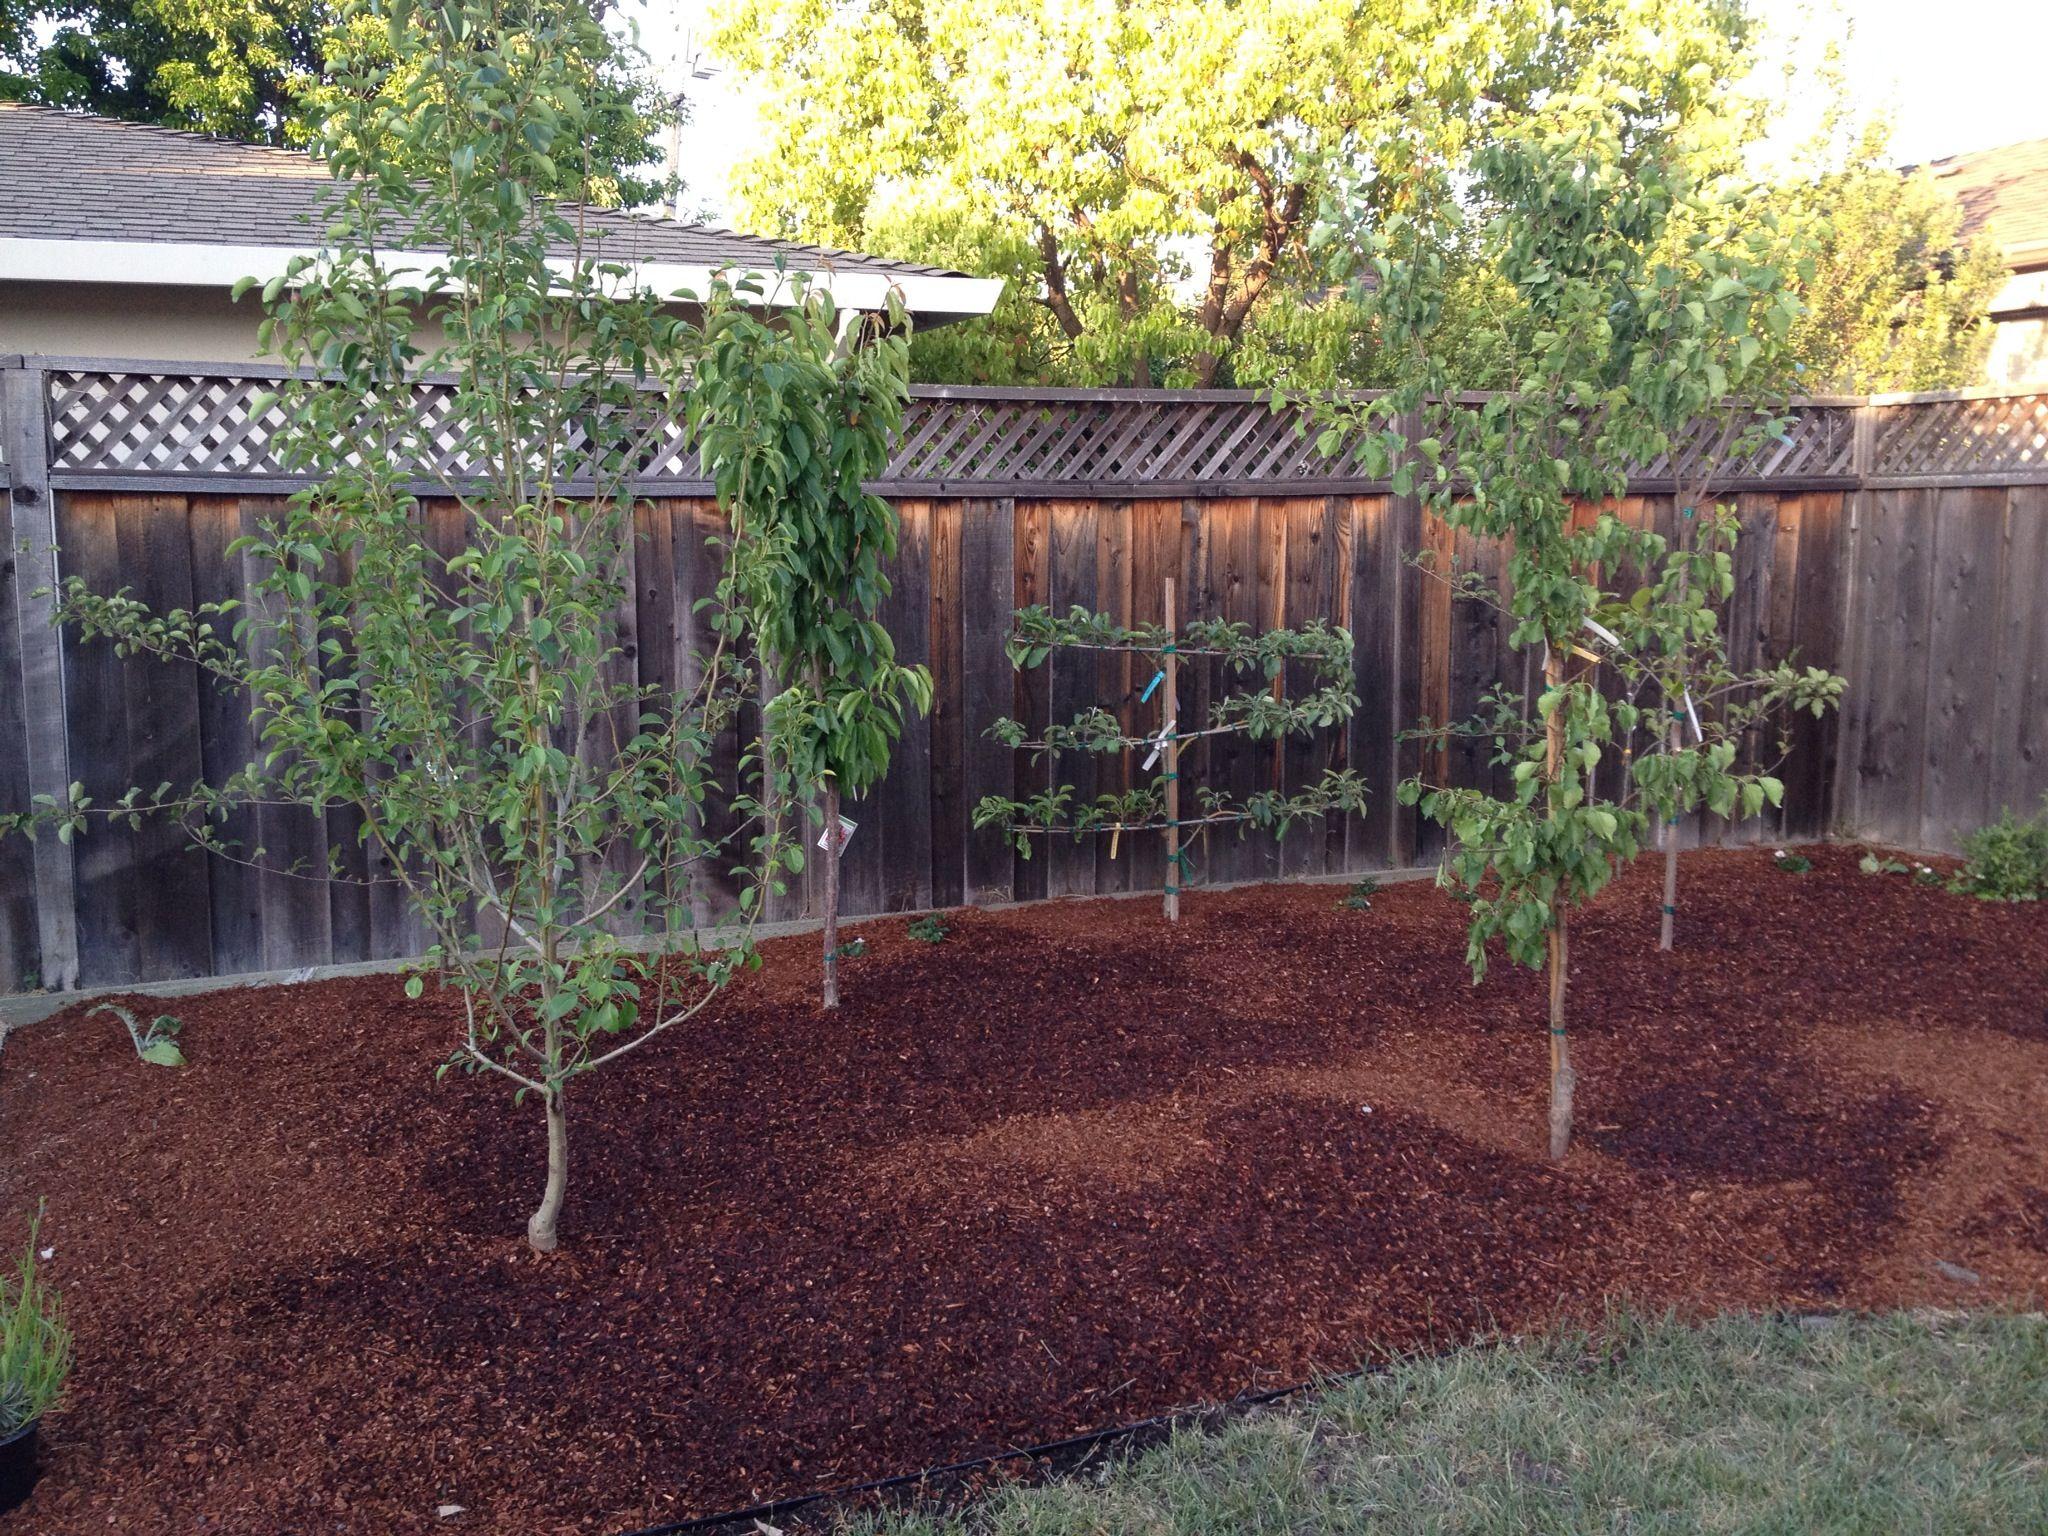 4/28/13: Fruit trees in the backyard planted | Backyard ...